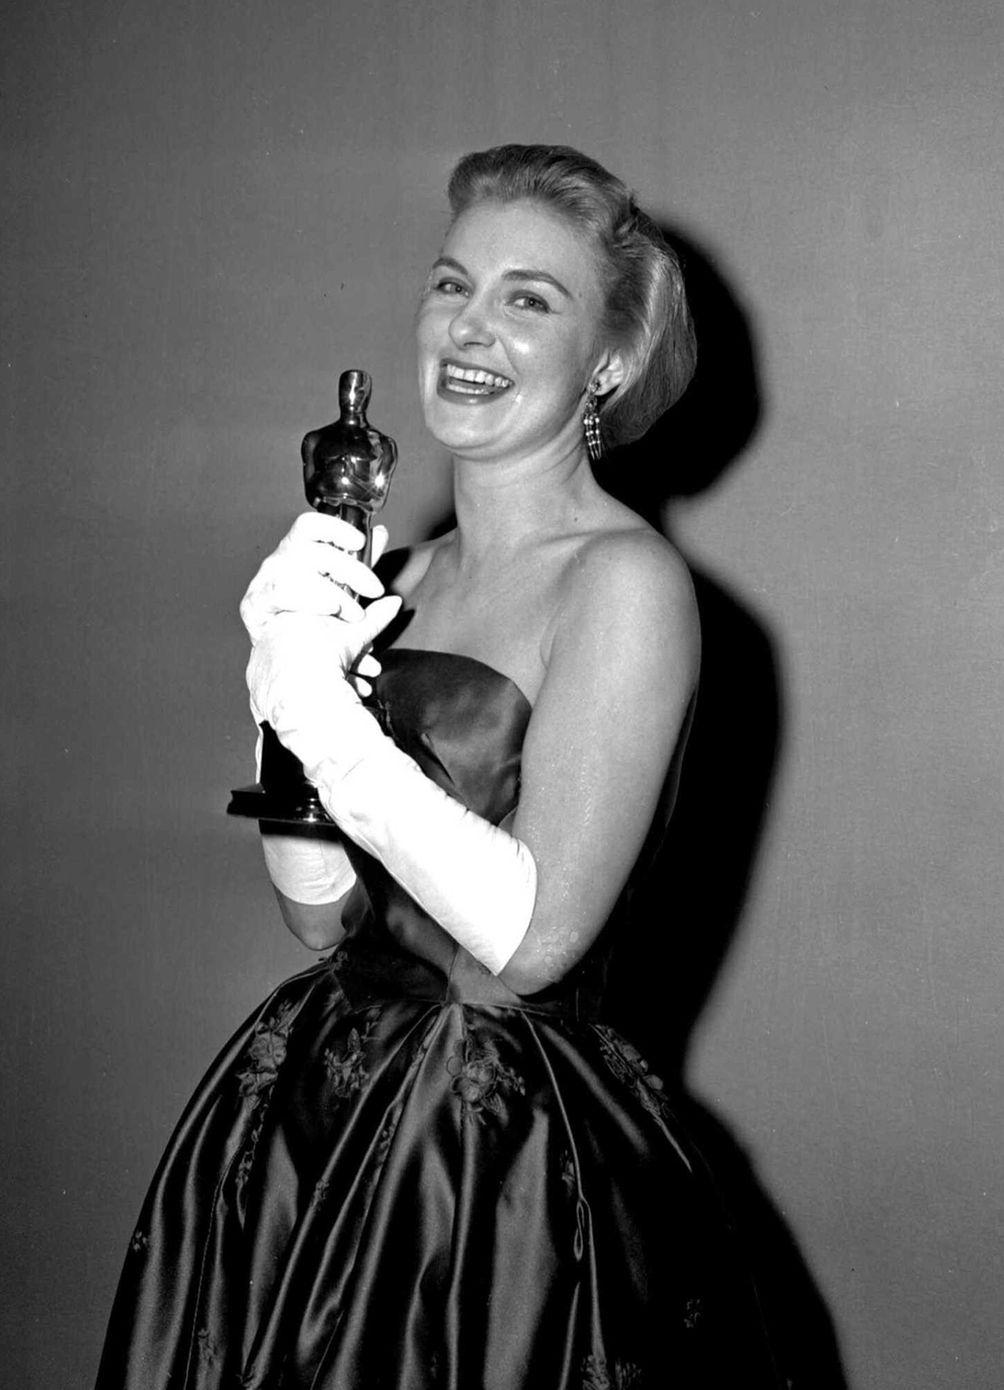 Actor Joanne Woodward, holding the Oscar statuette she